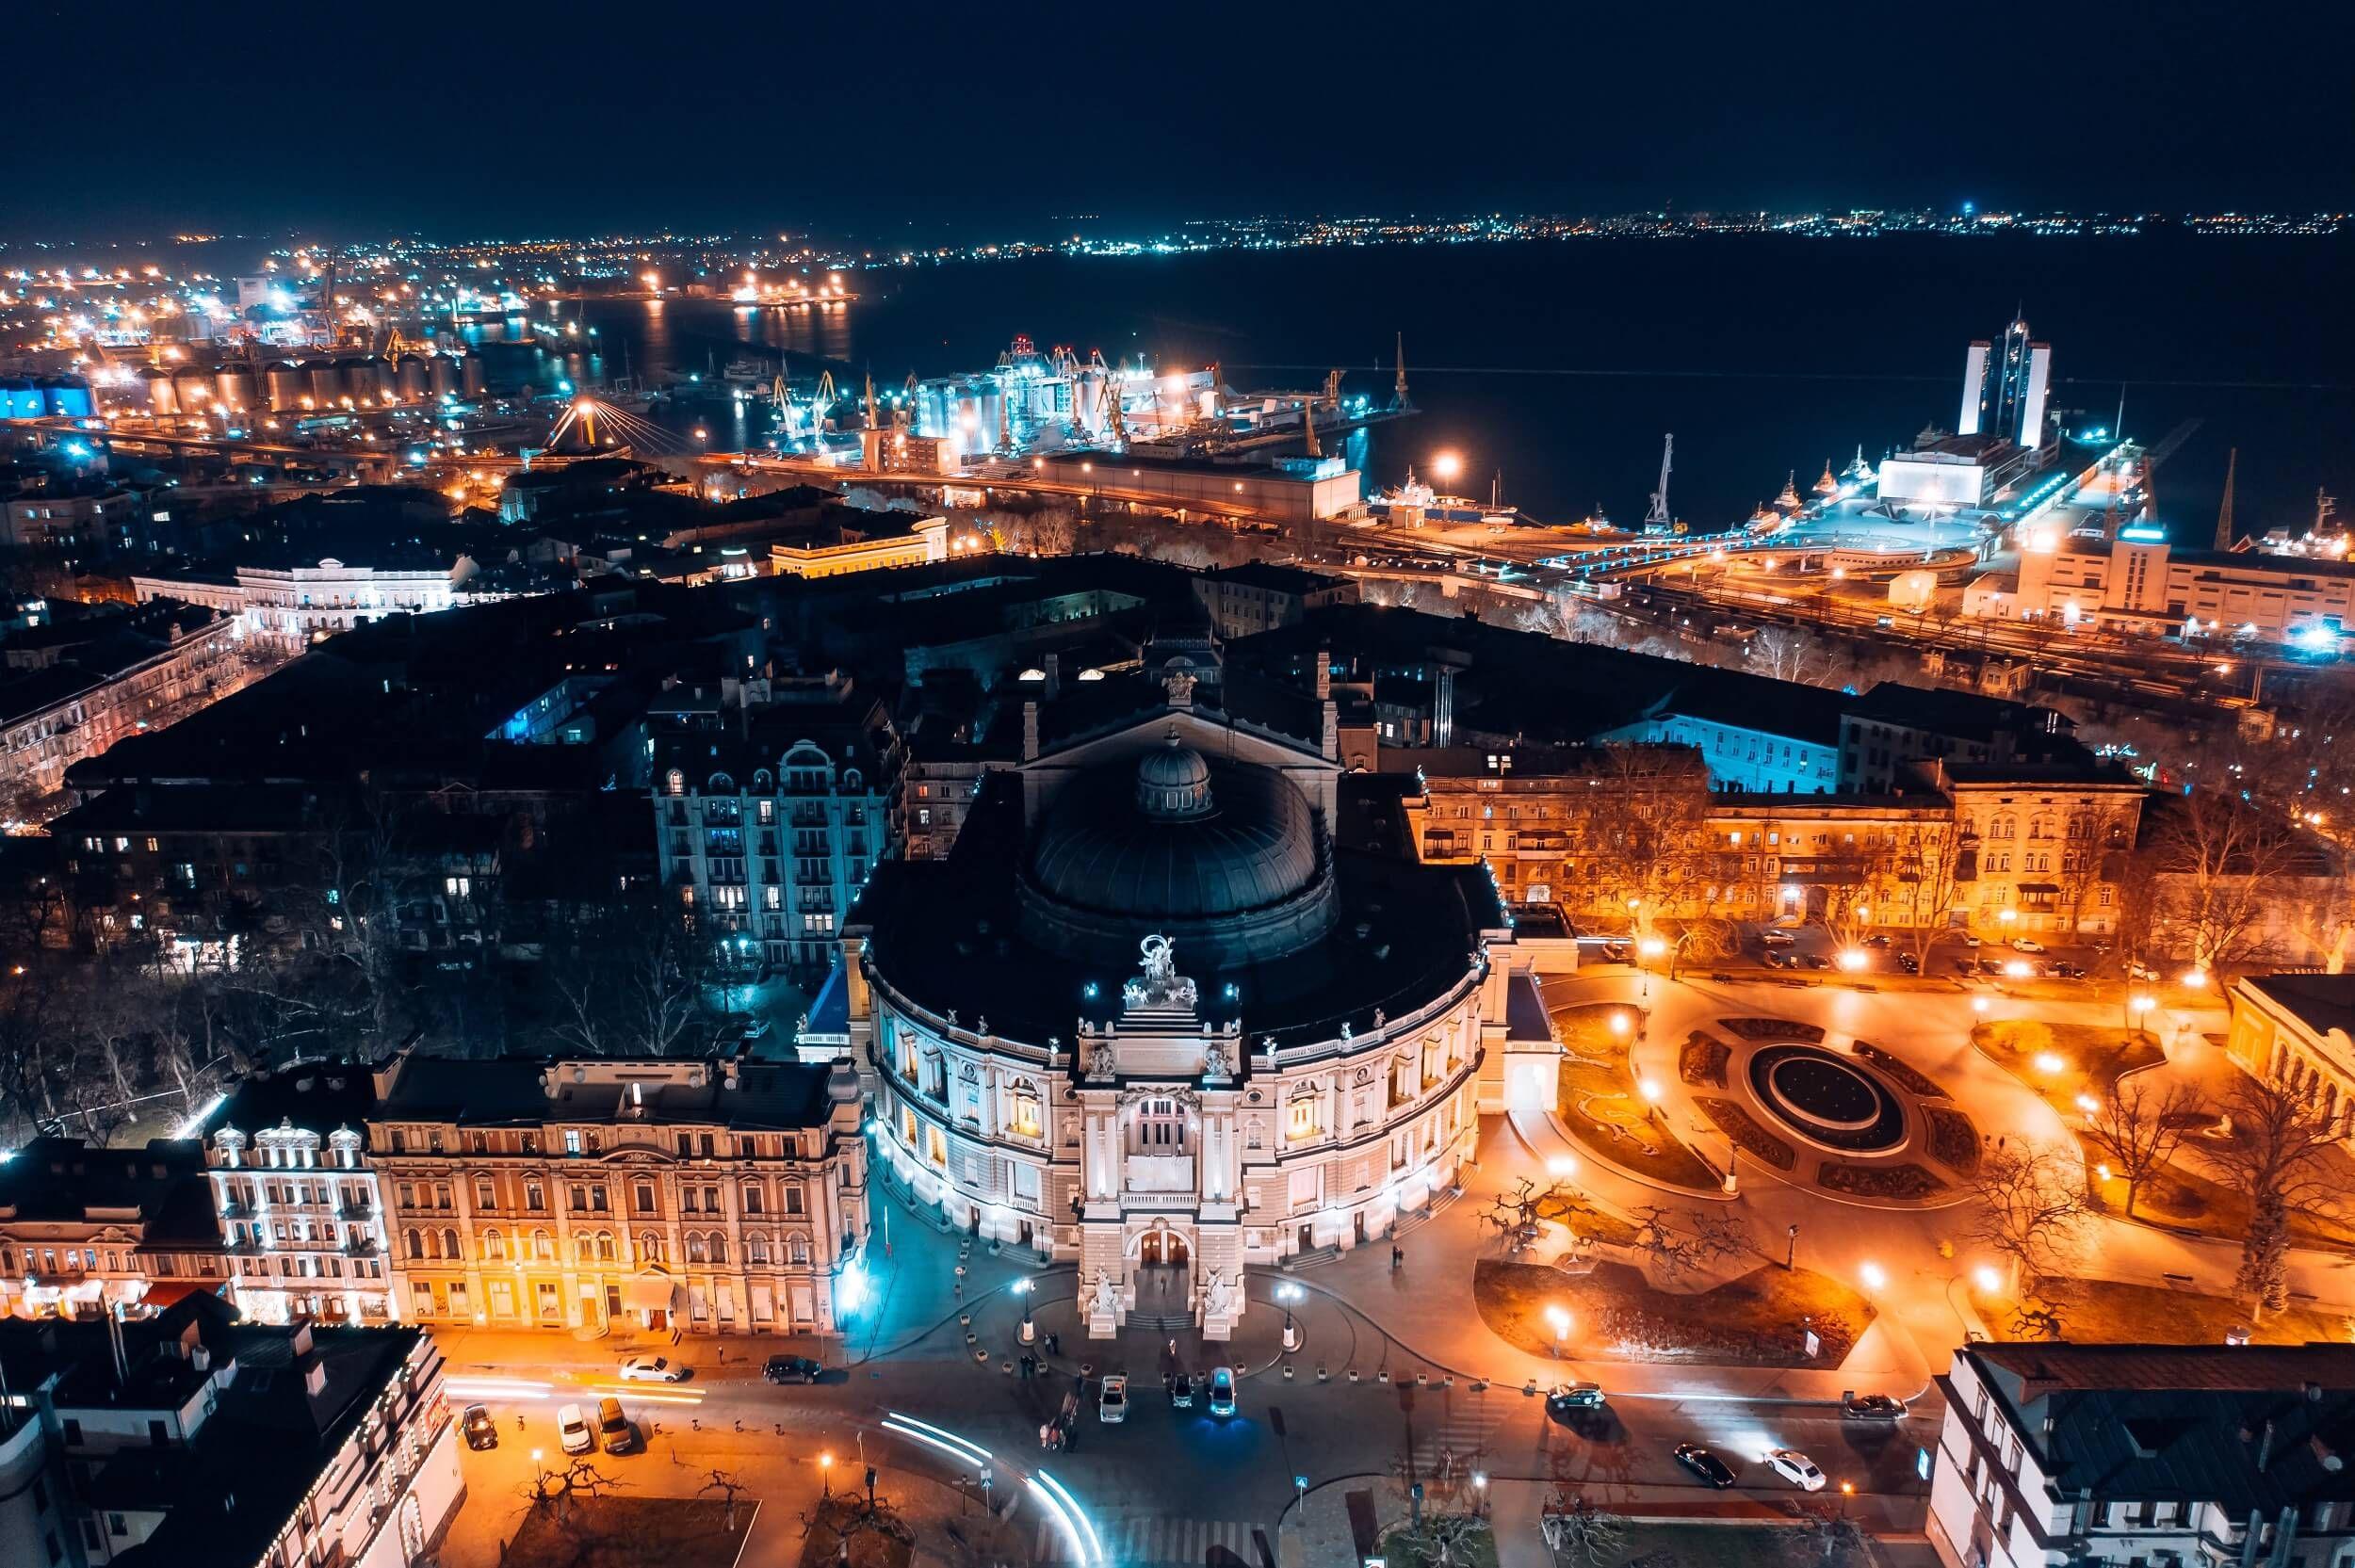 Destinazione Ucraina: meta d'Europa